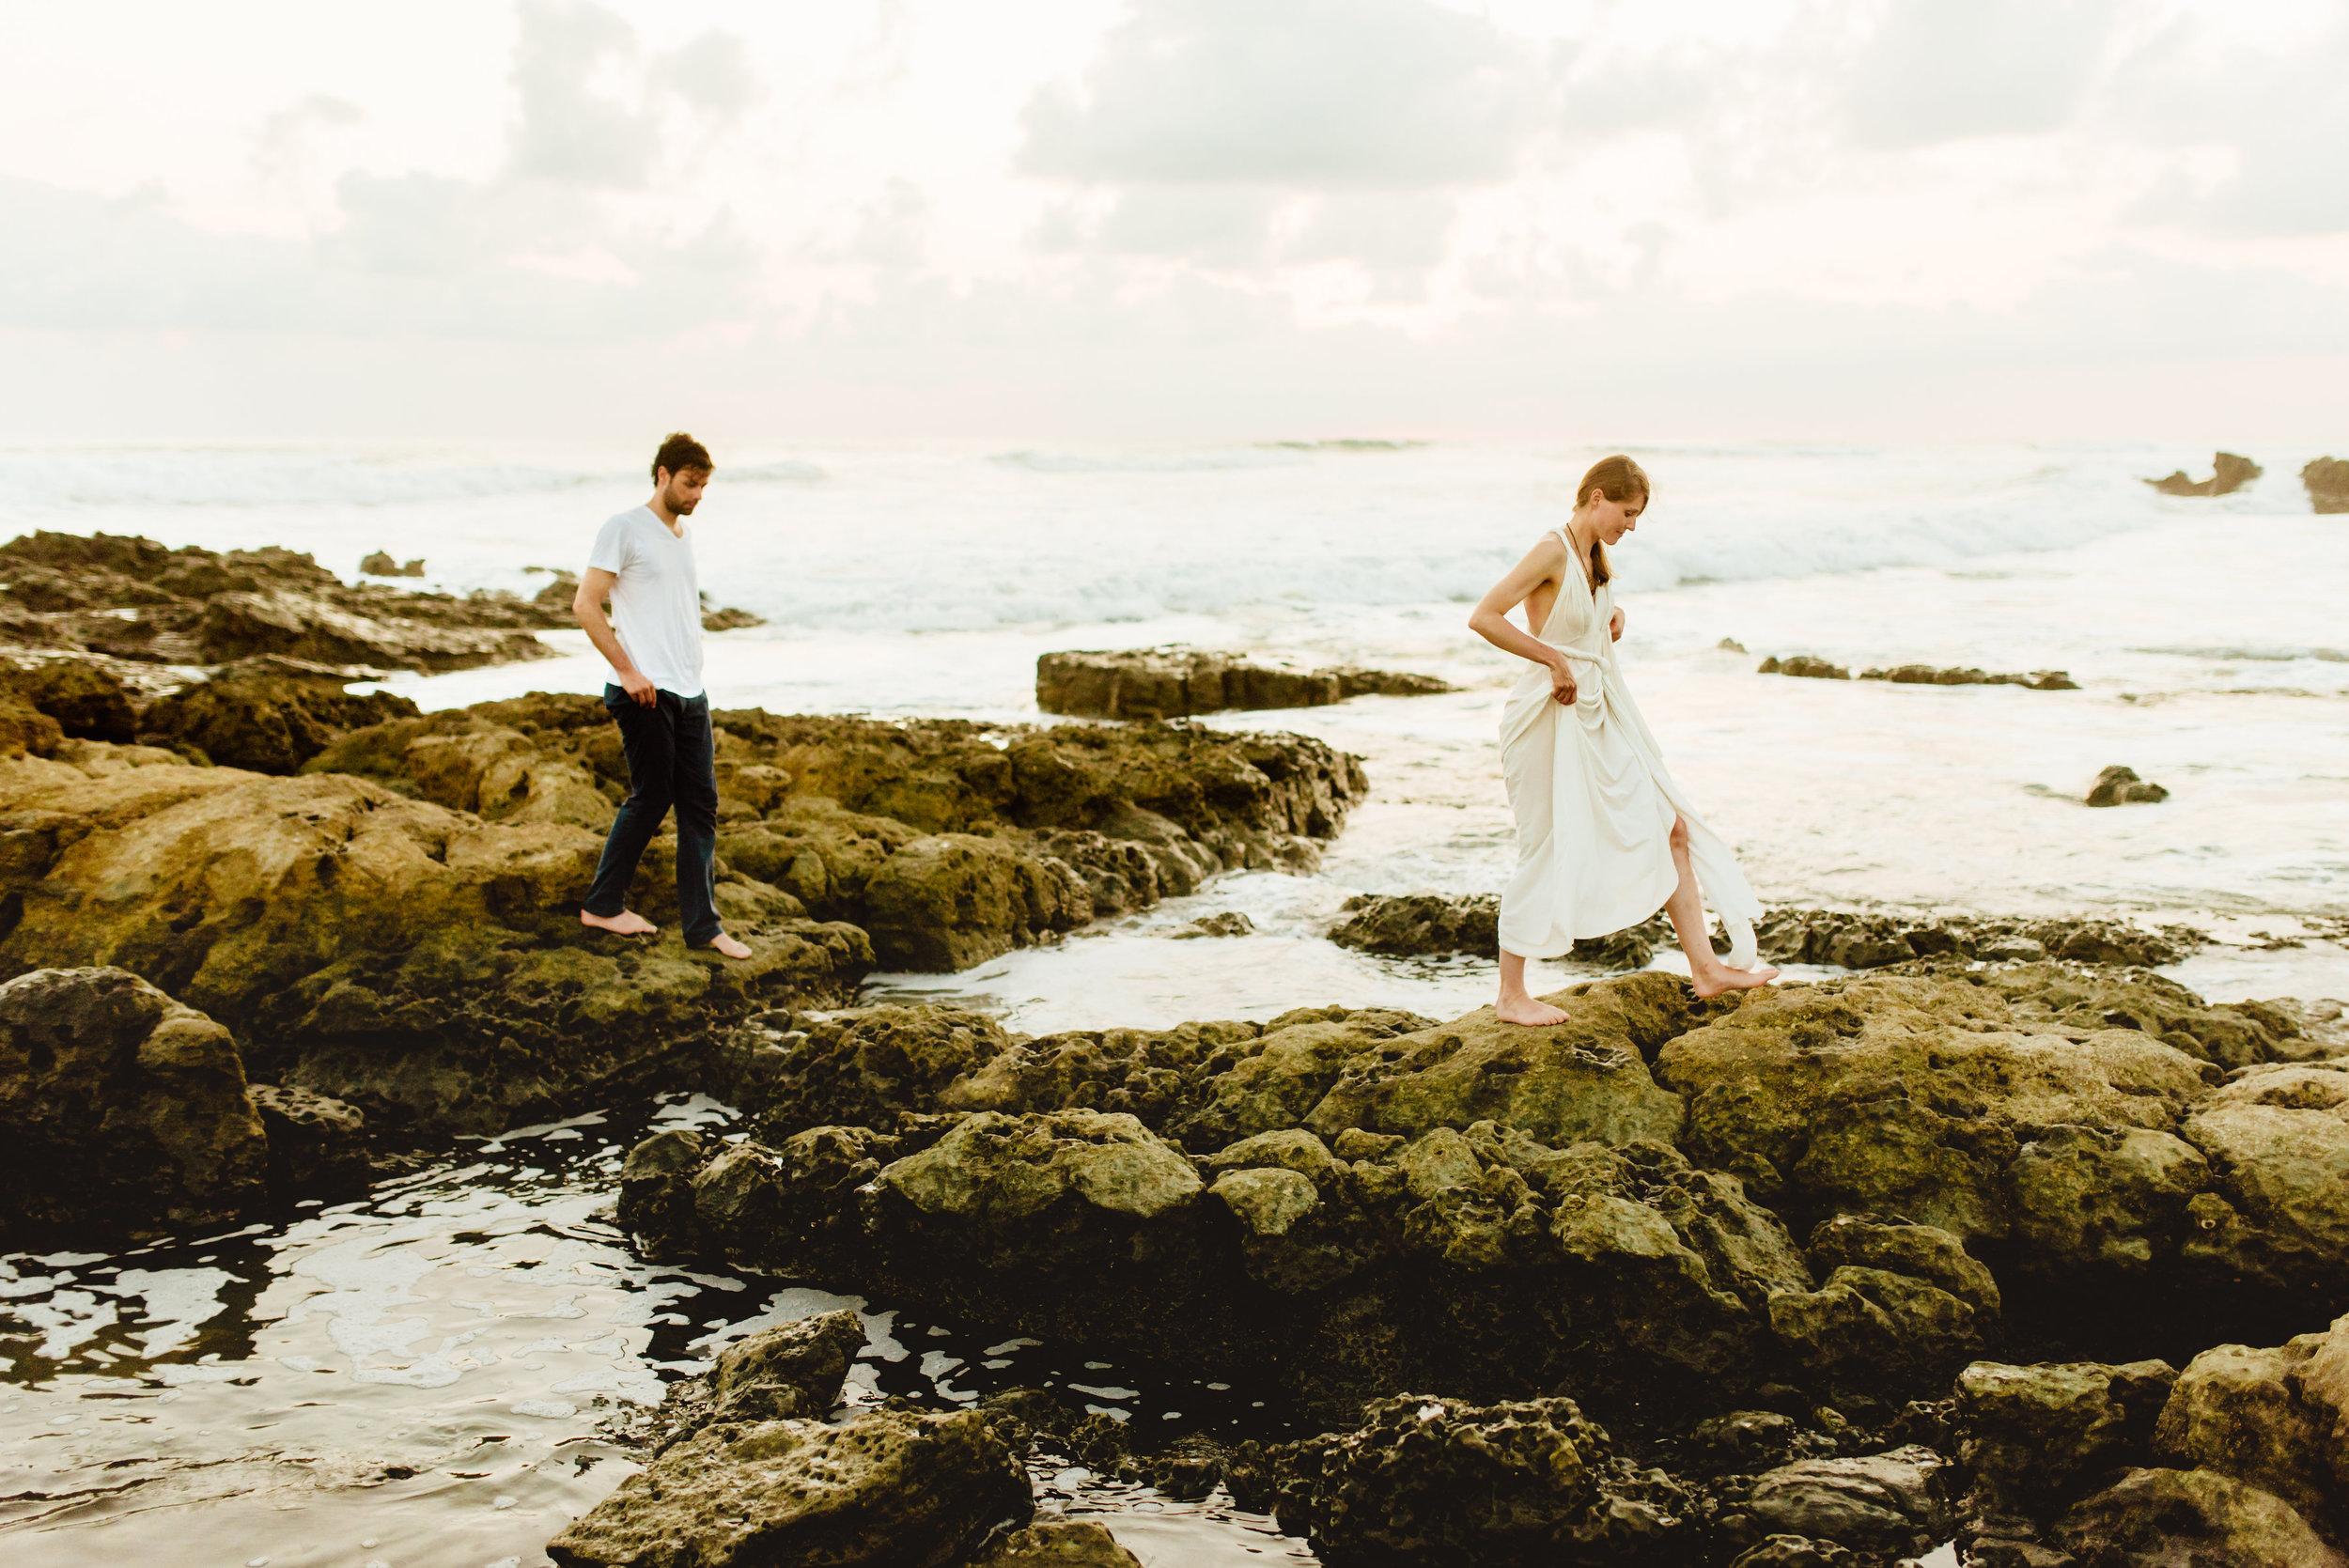 Martina's flowy, ivory dress makes for the perfect beach wedding dress! Casual destination weddings are definitely my favorite!  Beach wedding photography by destination wedding photographer, Maddie Mae.